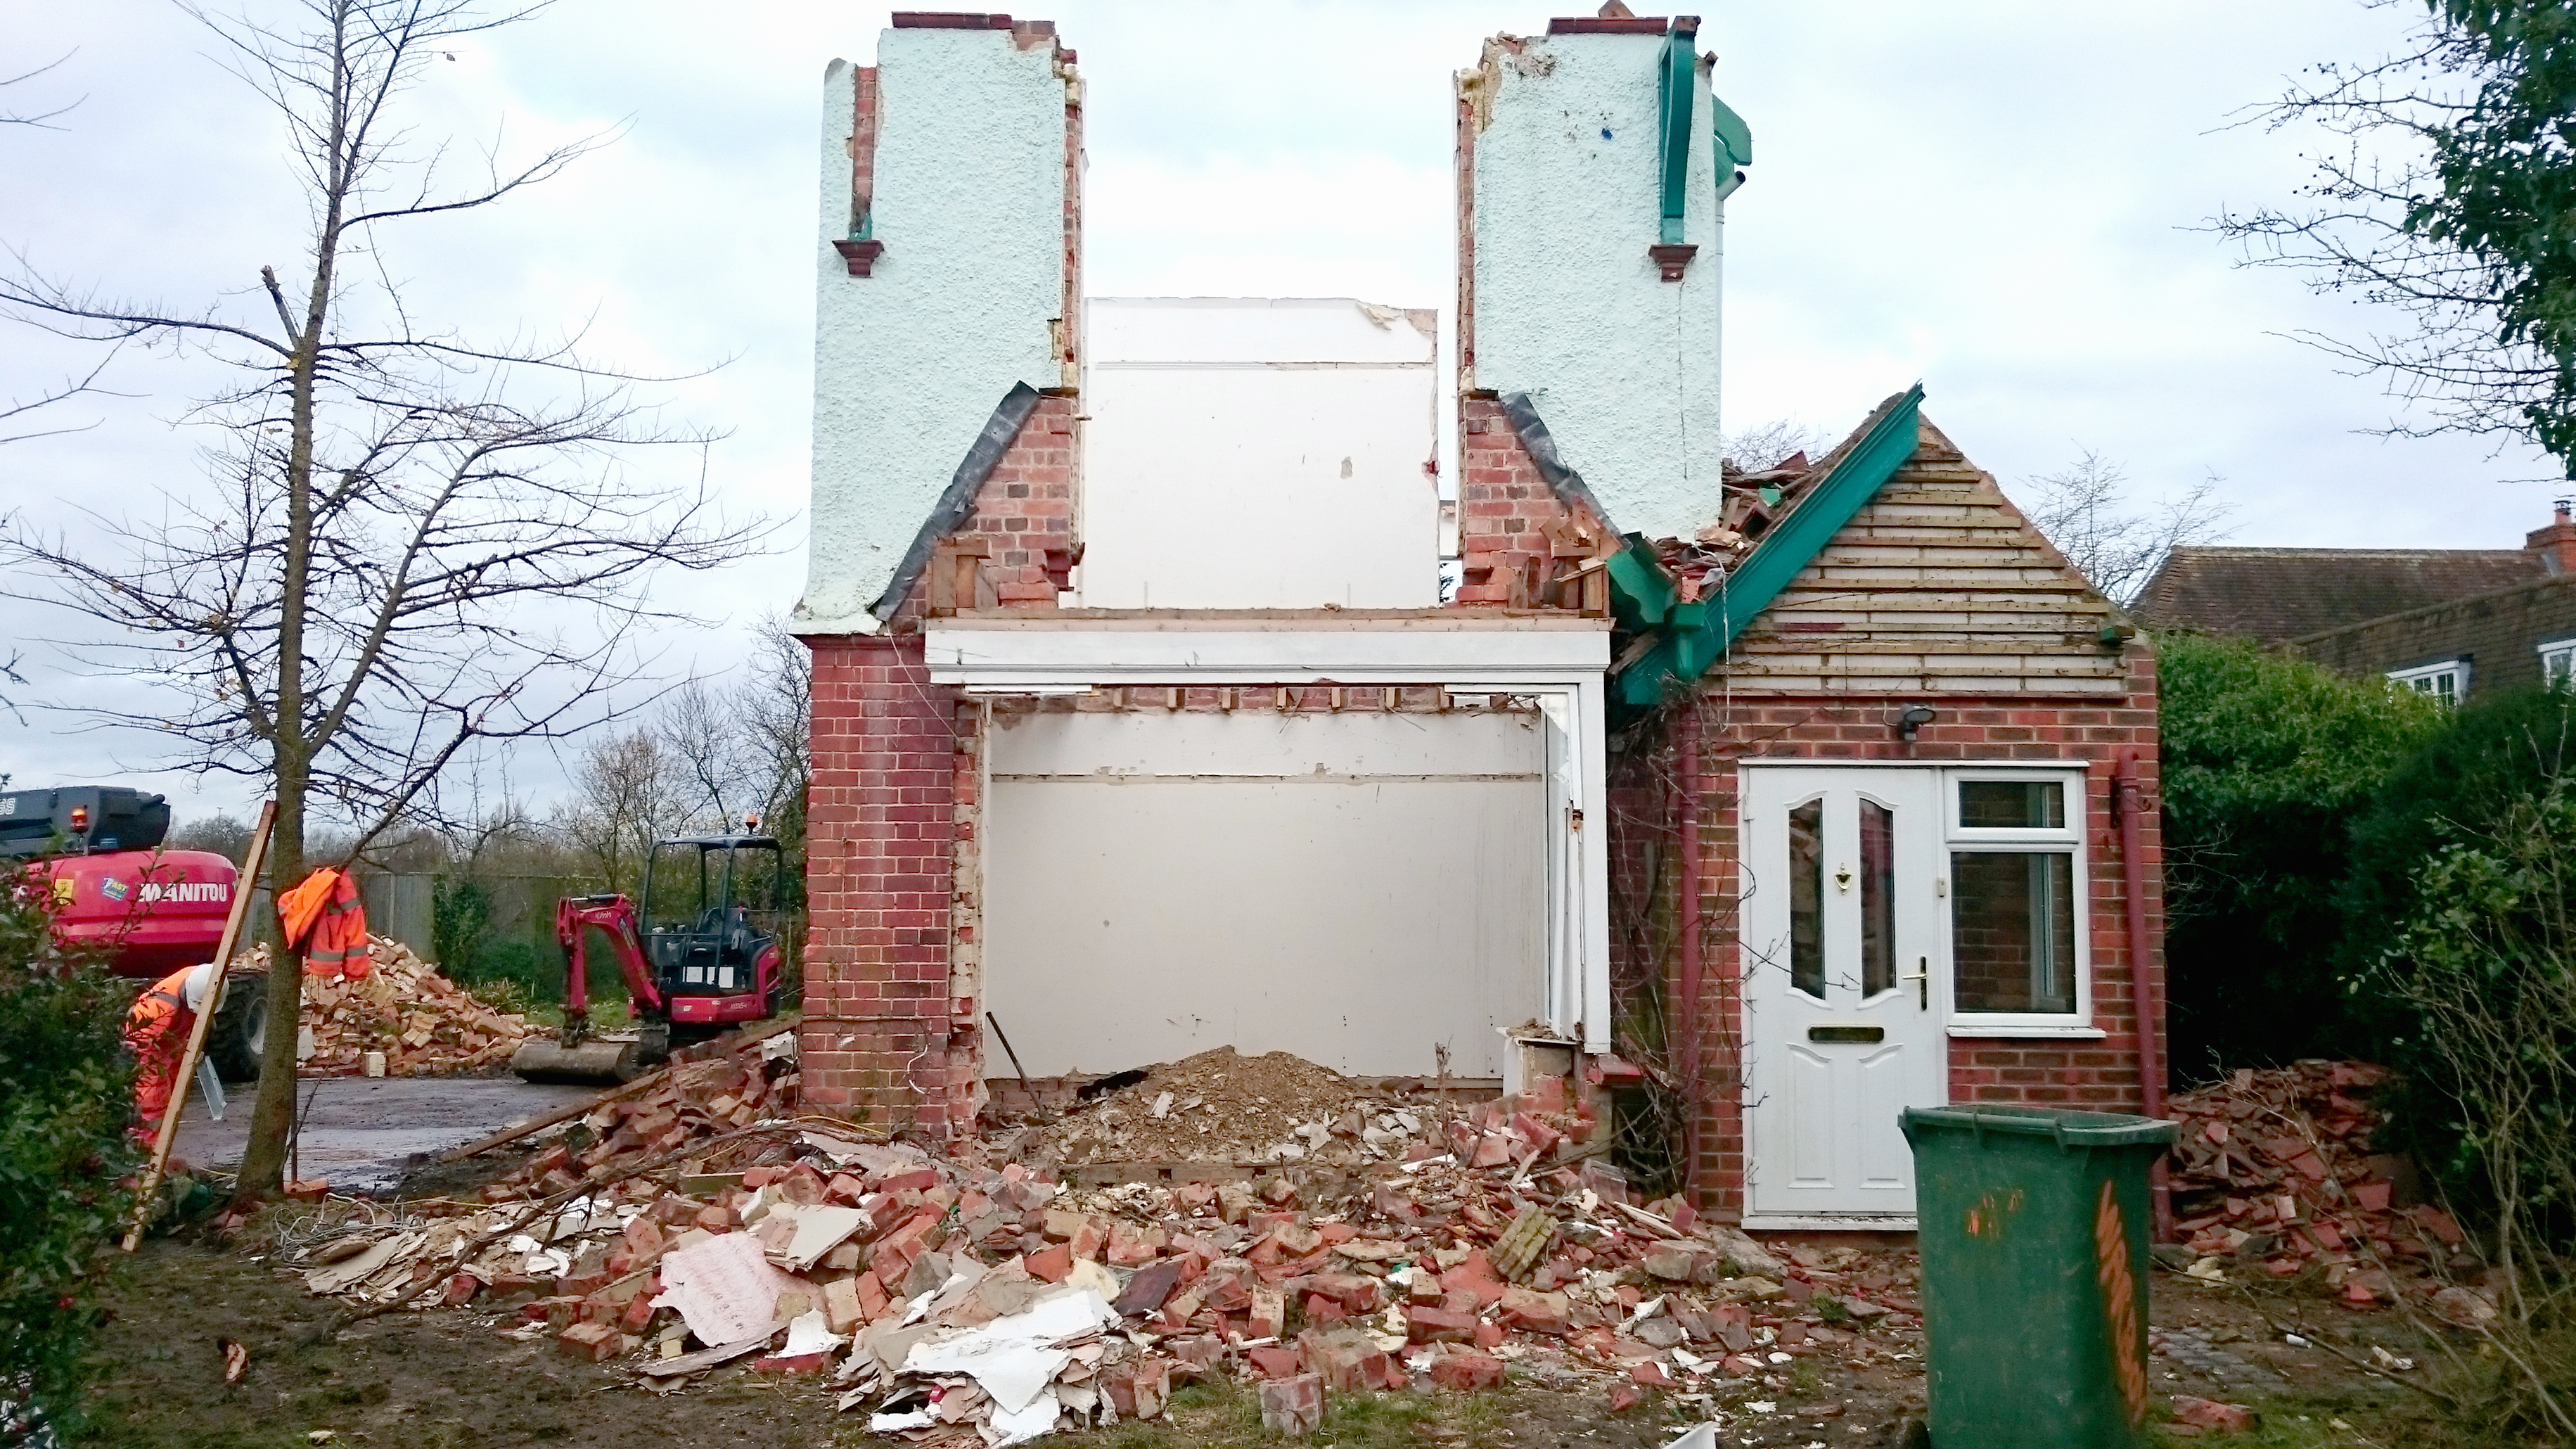 Project 3 - House Demolition image 2